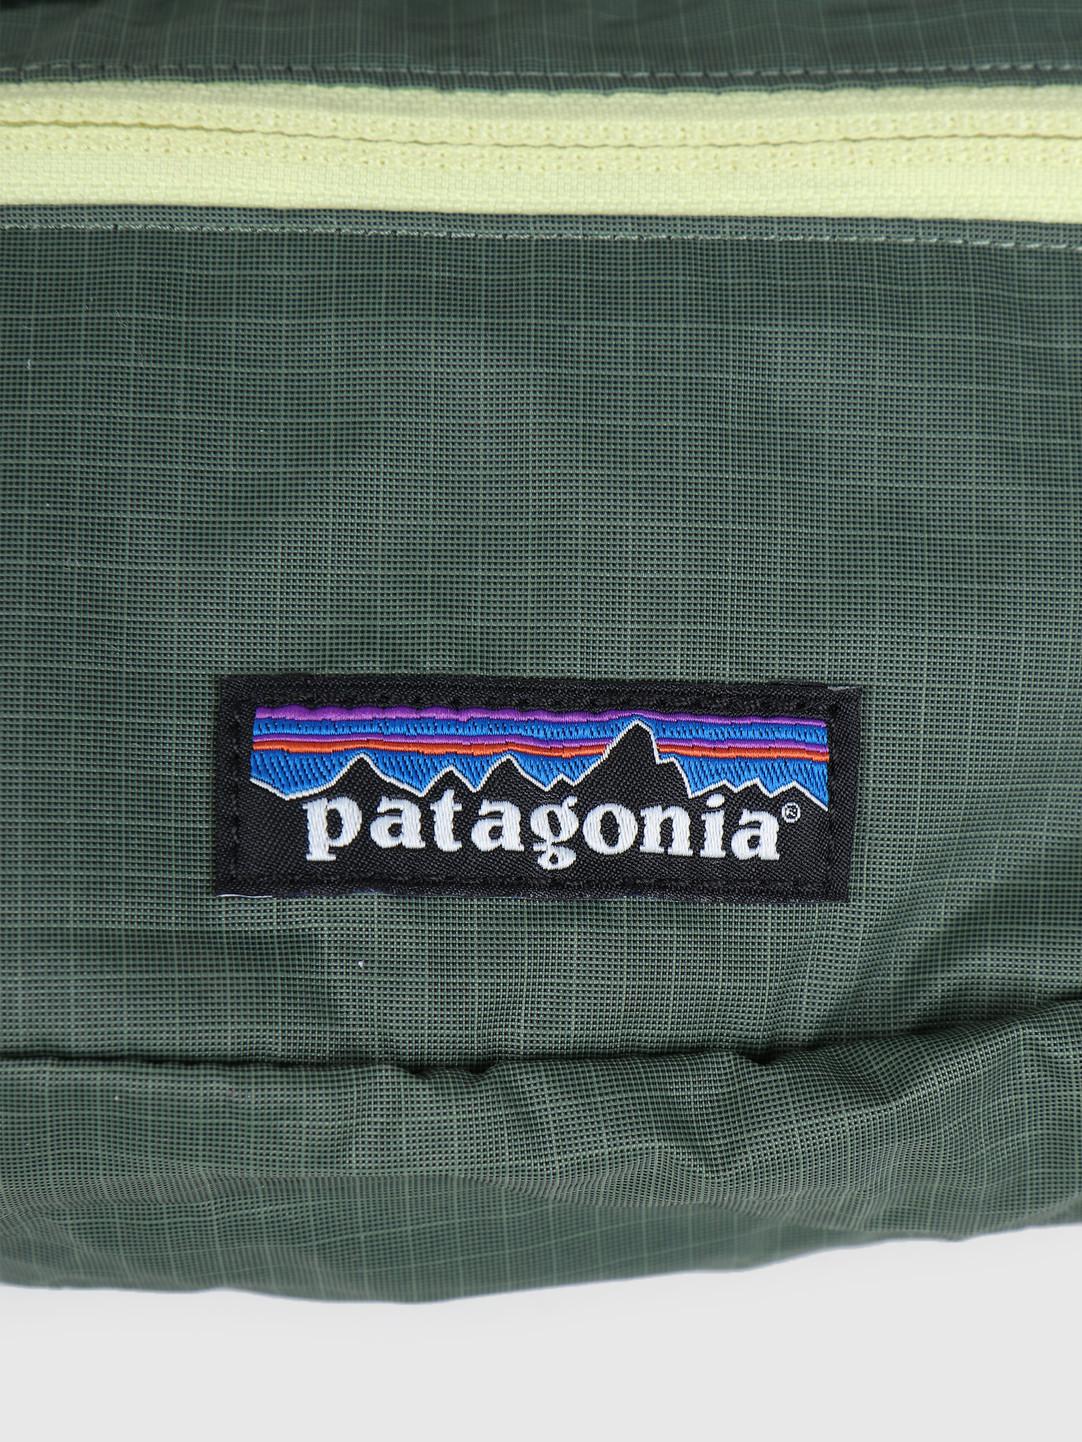 Patagonia Patagonia Ultralight Black Hole Mini Hip Pack Camp Green 49447